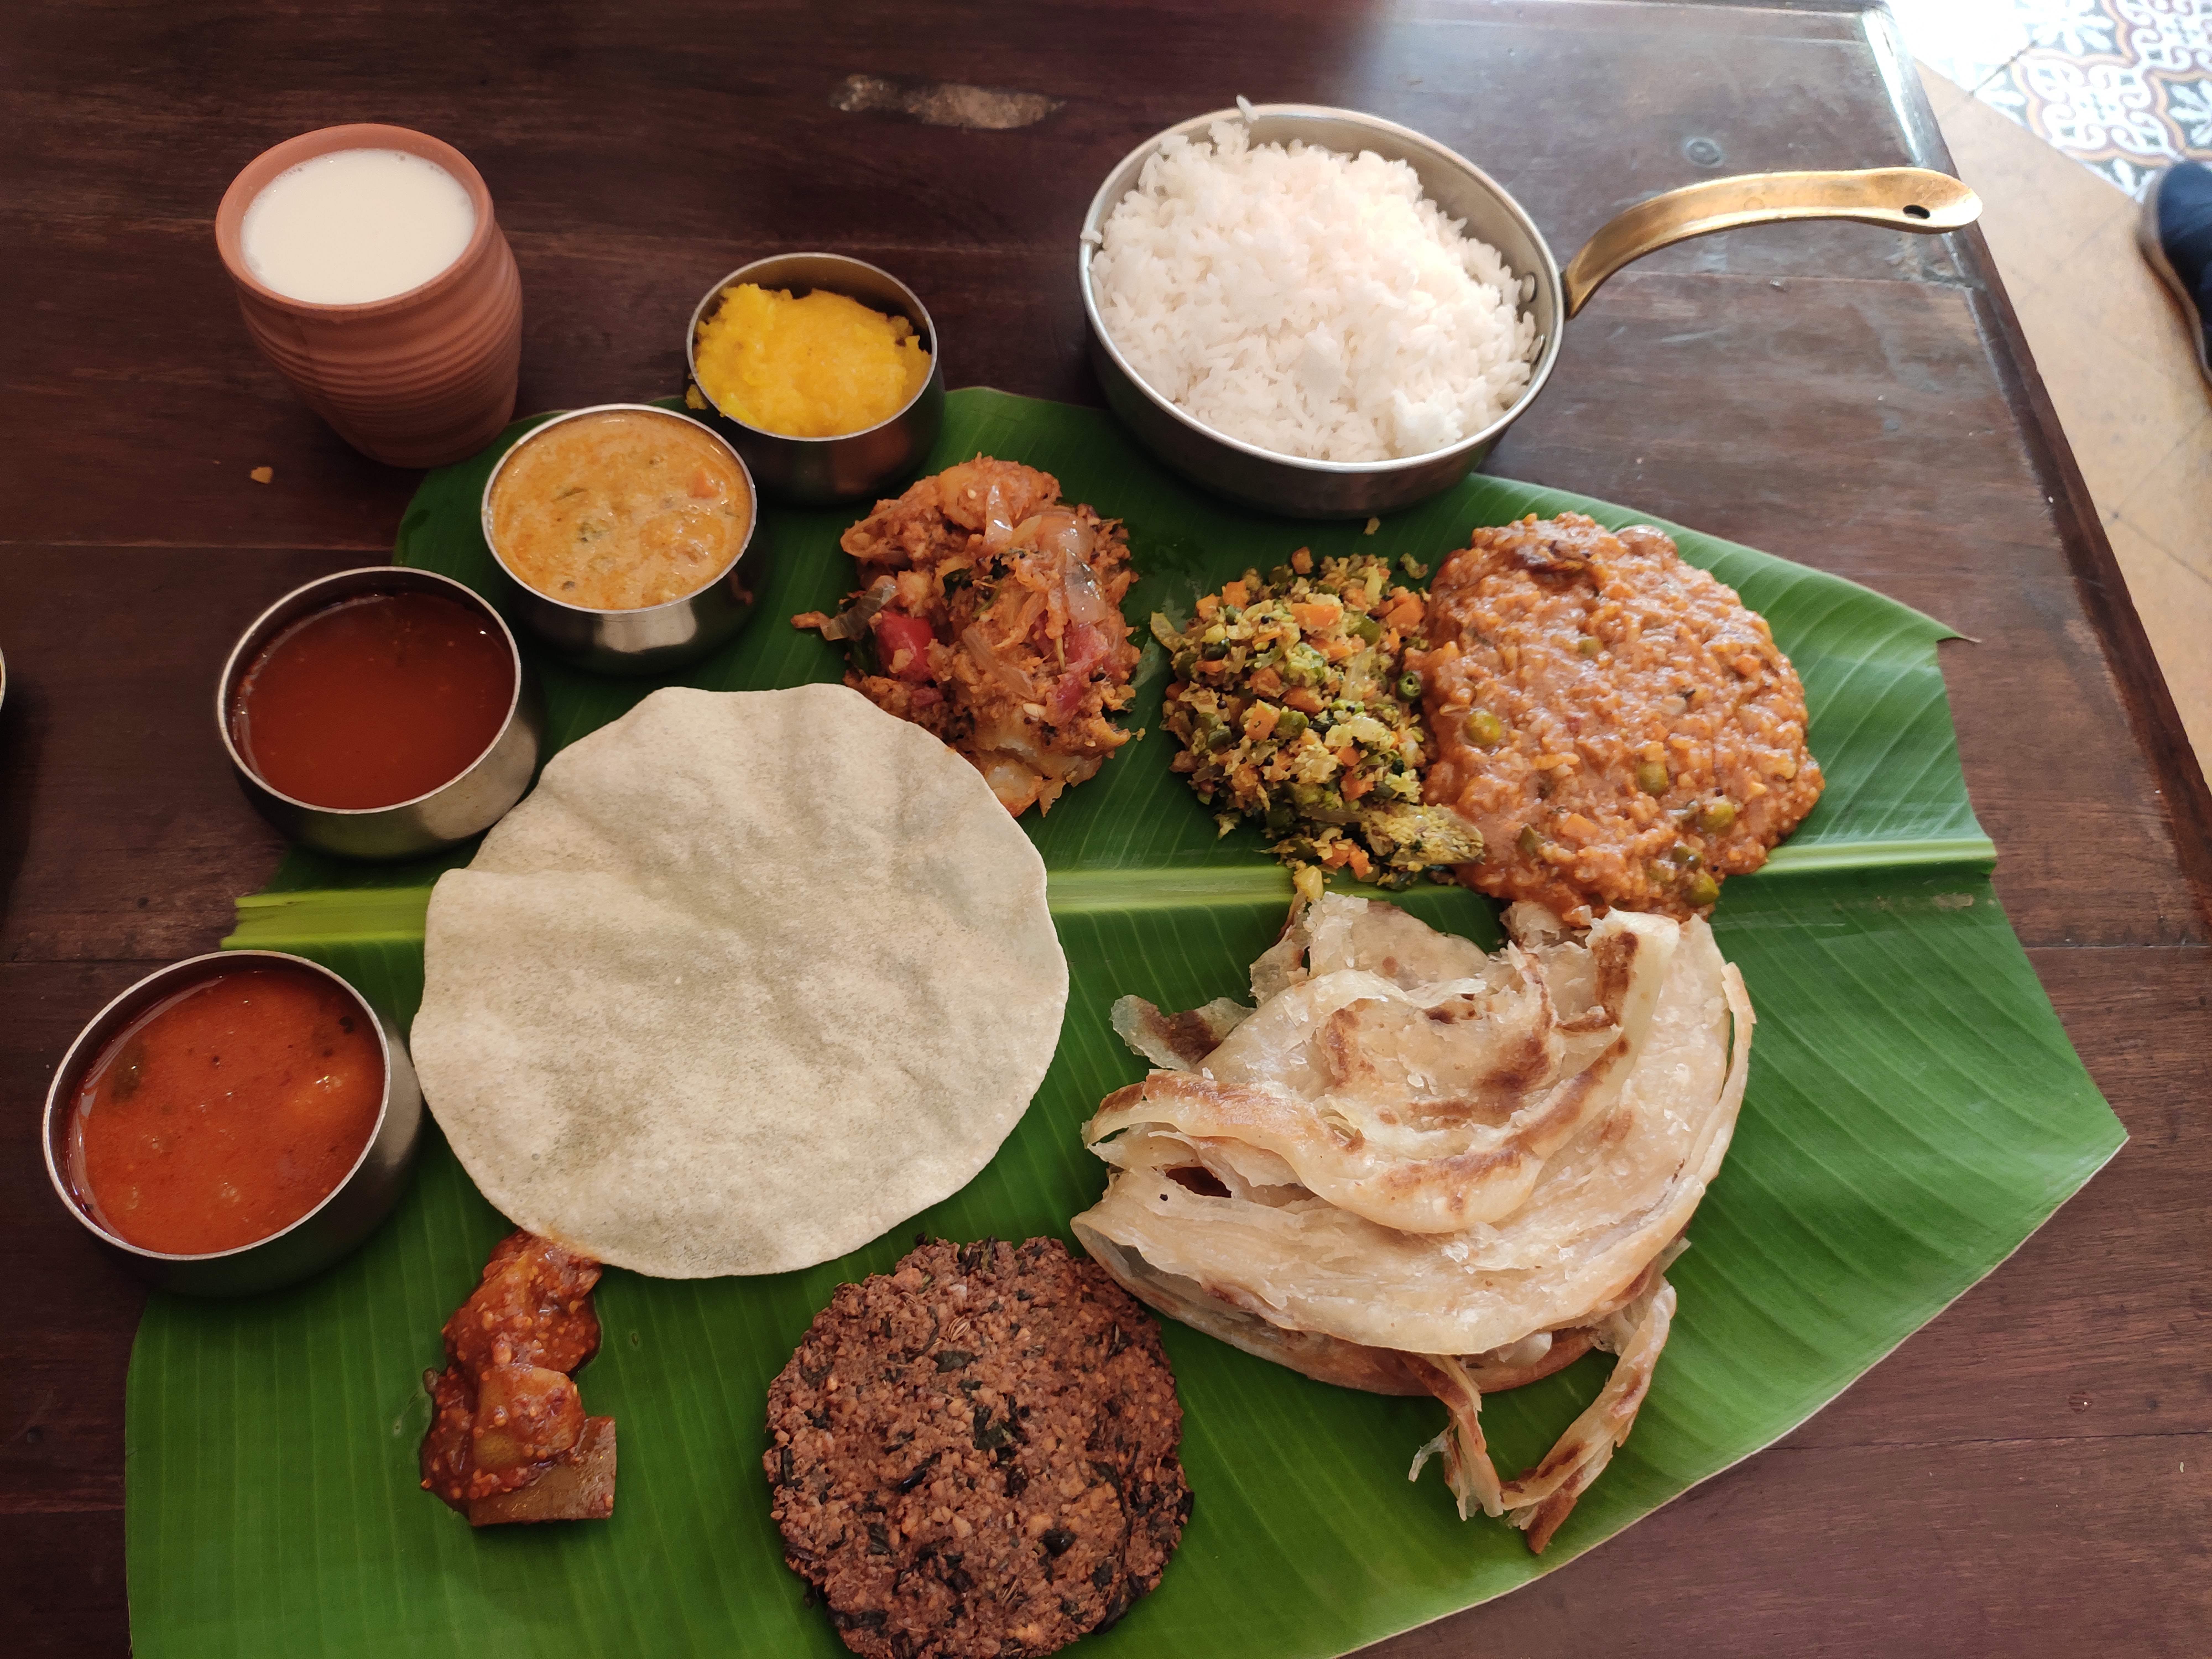 Dish,Food,Cuisine,Ingredient,Vegetarian food,Meal,Indian cuisine,Produce,Andhra food,Fried food